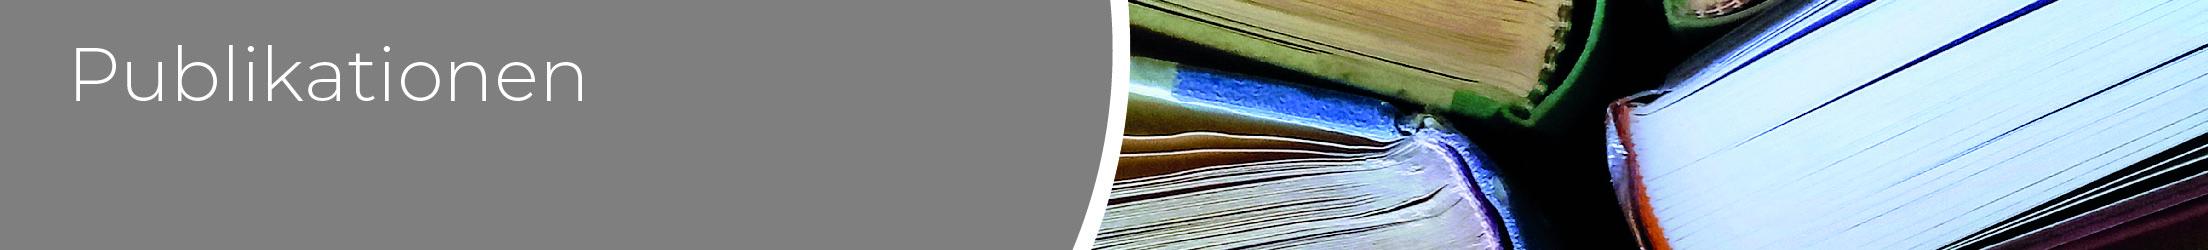 Publikationen.jpg